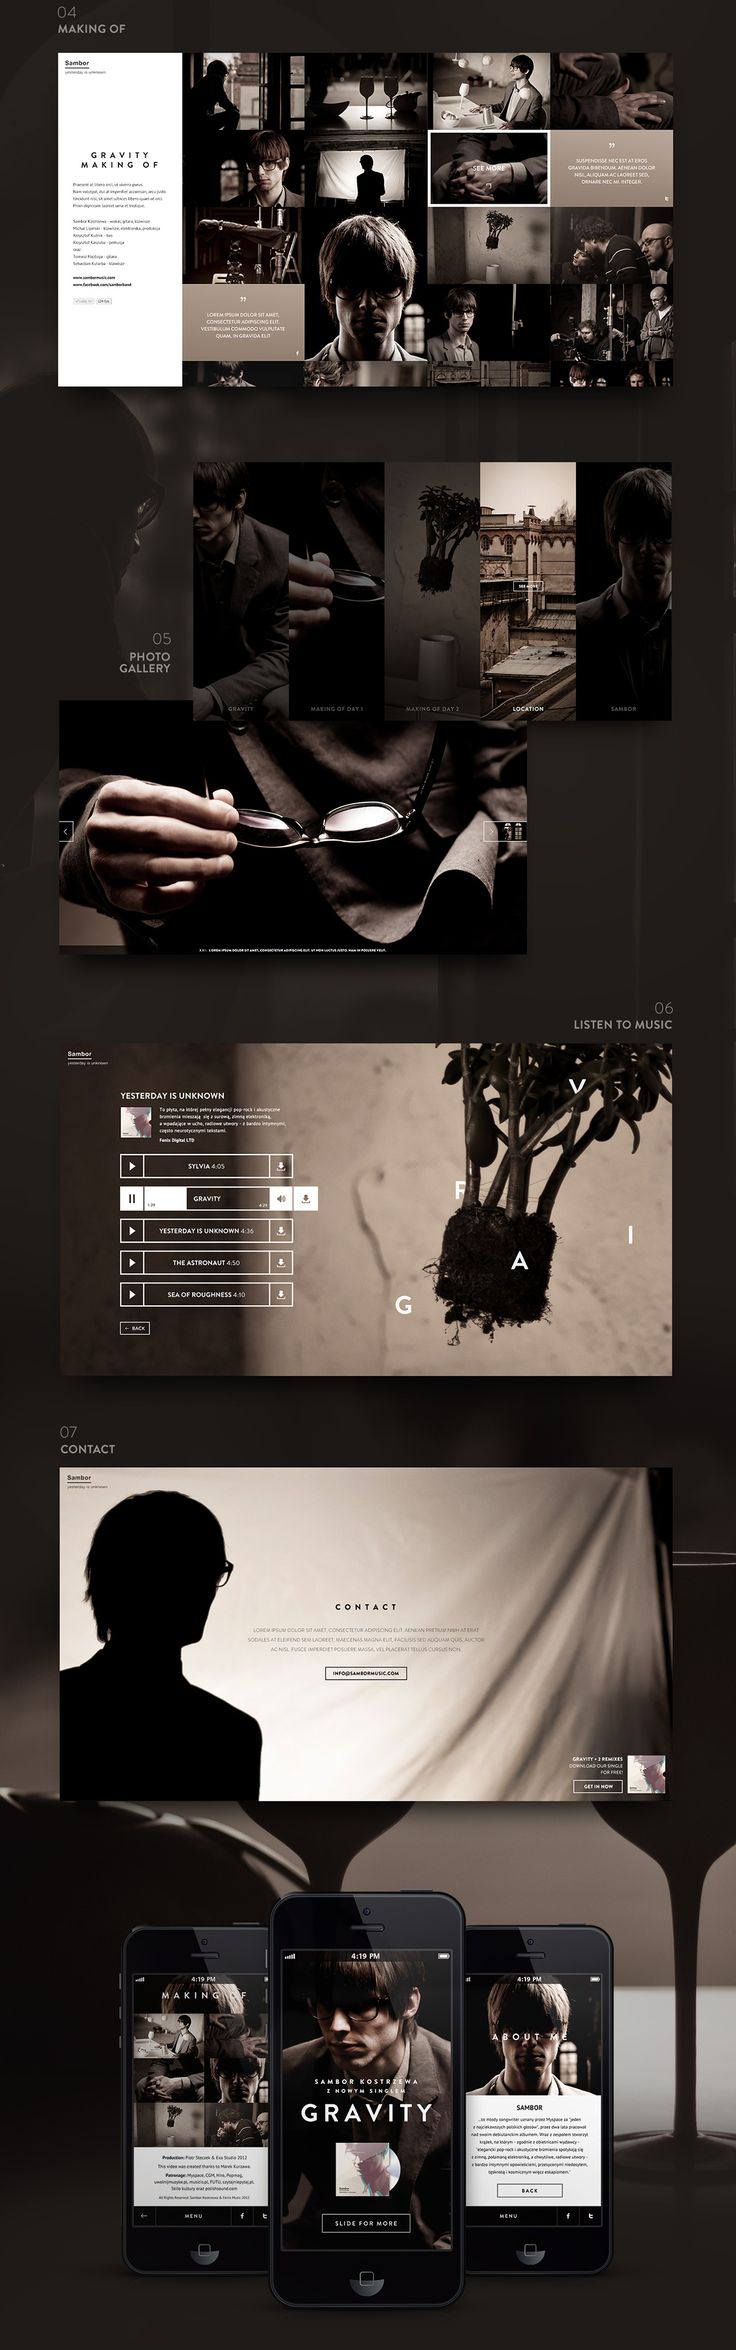 GRAVITY Sambor Kostrzewa on Web Design Served